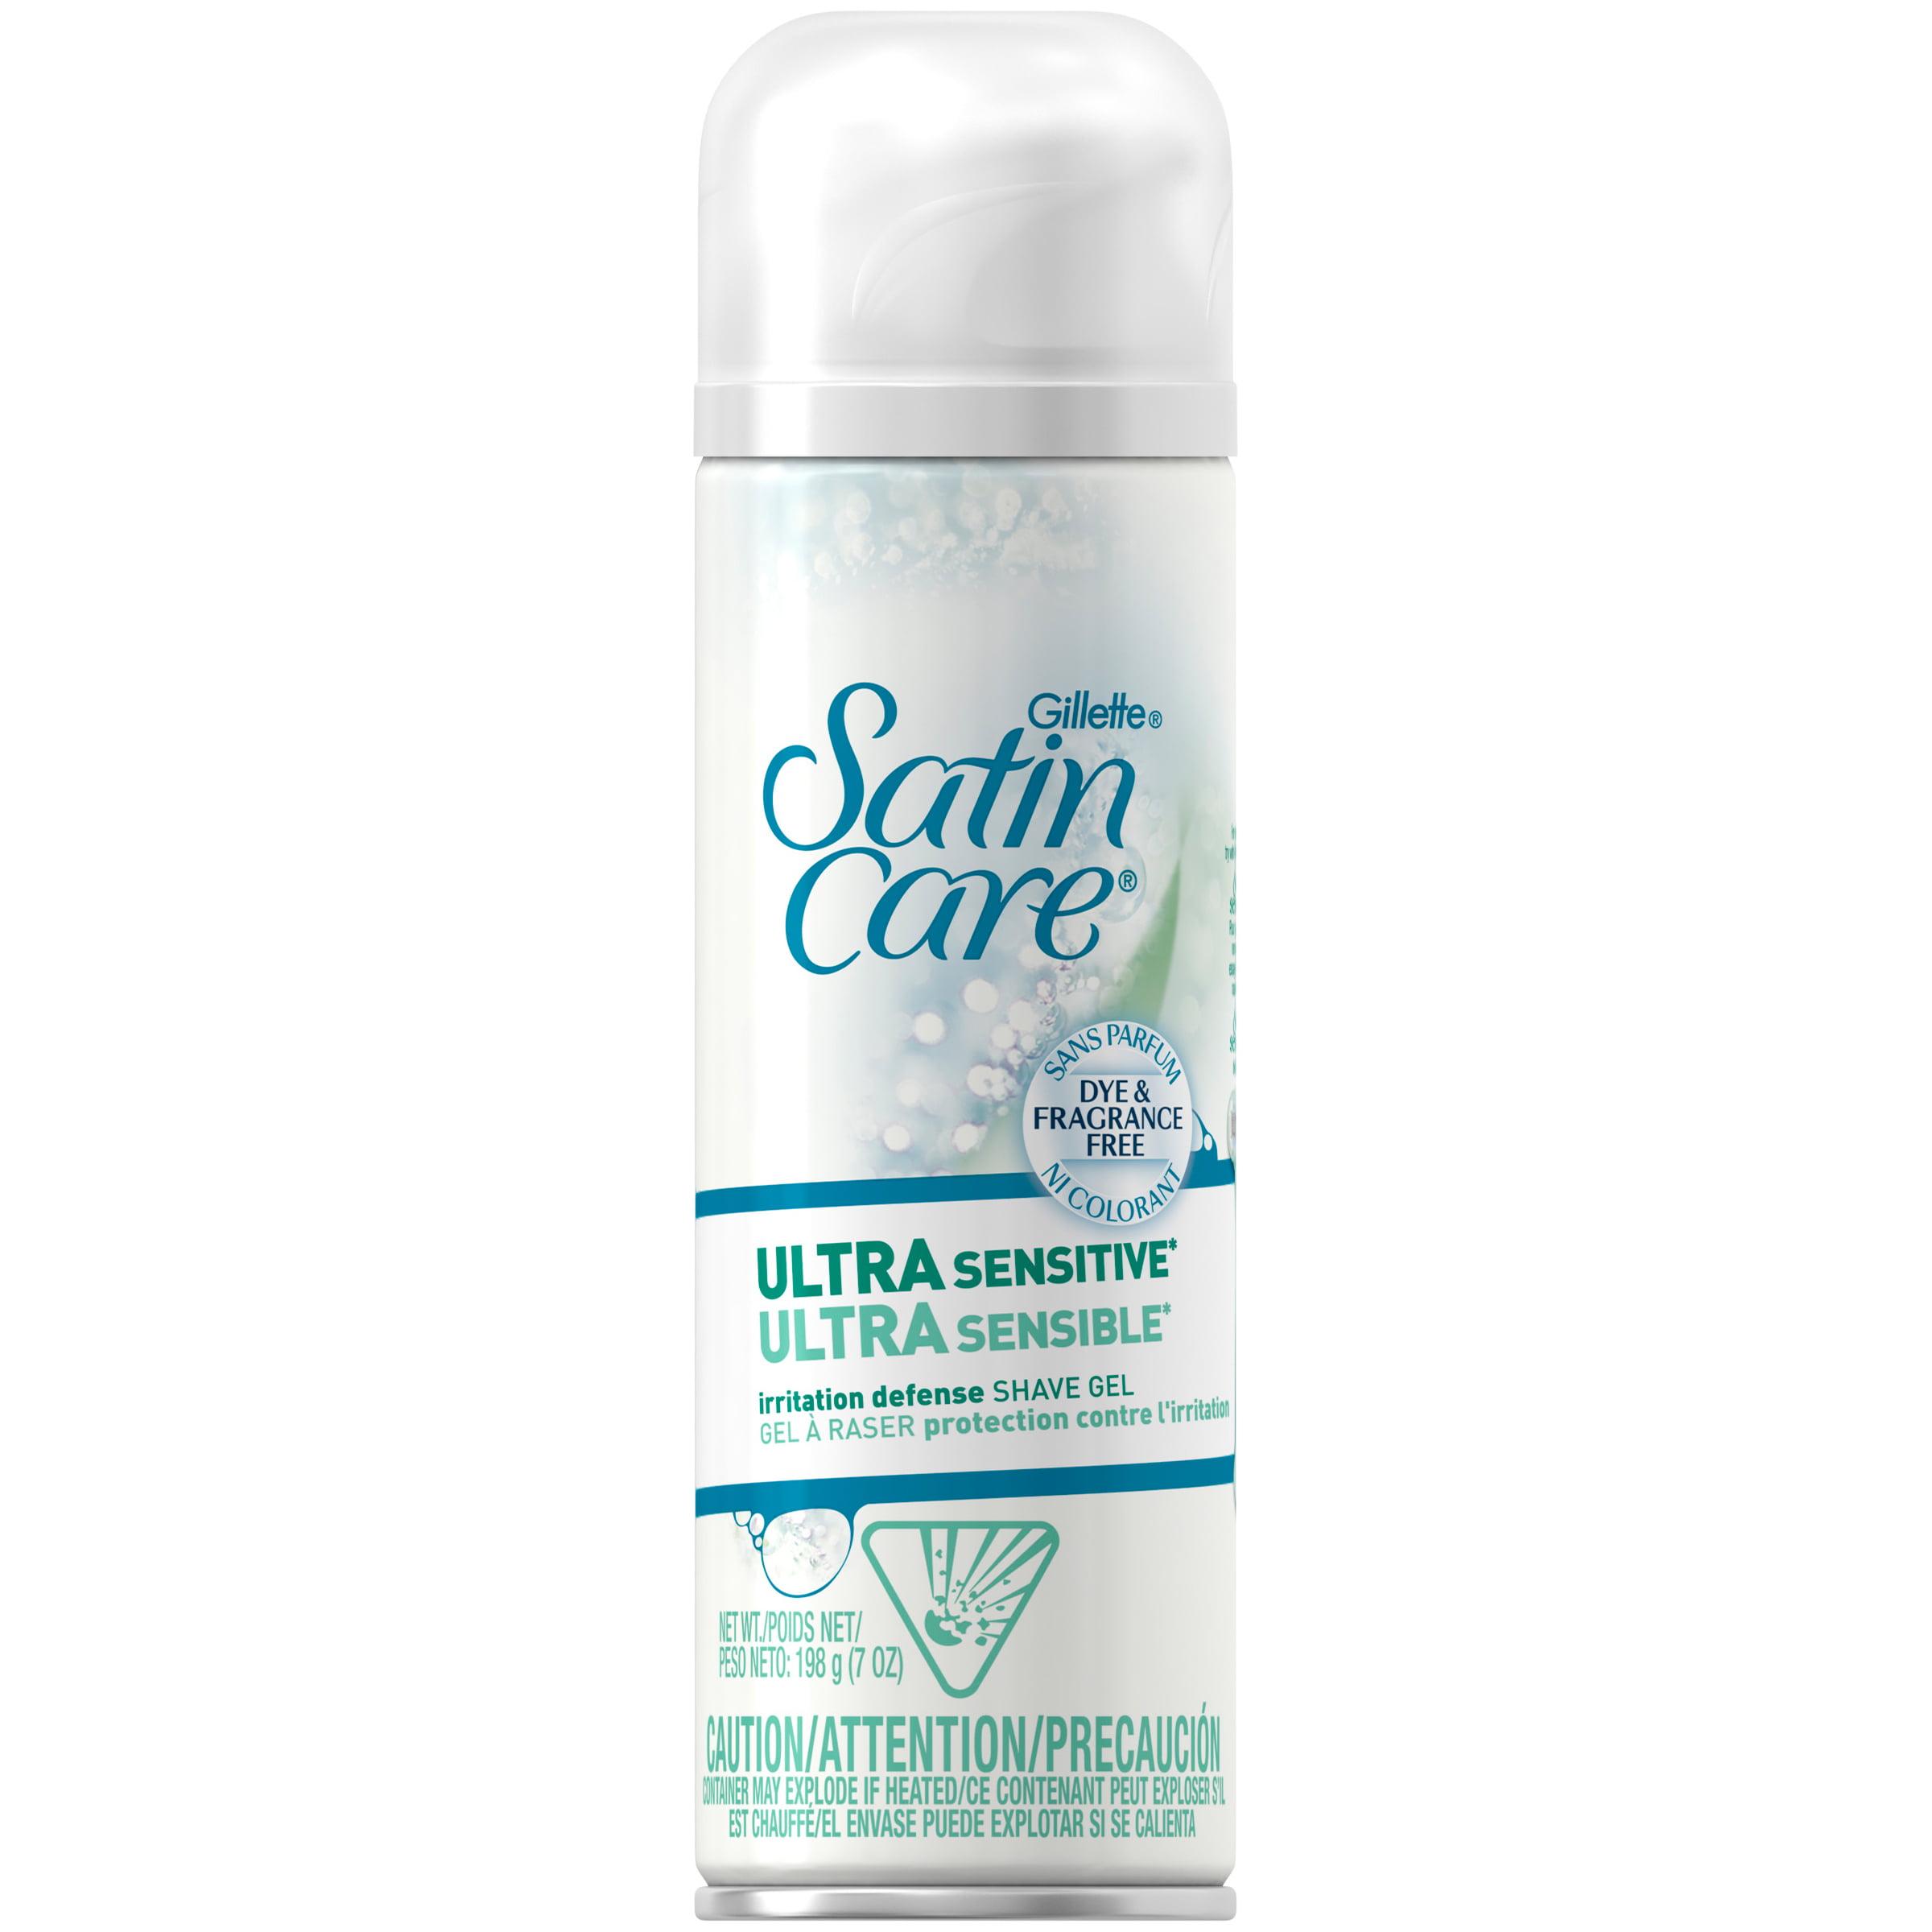 Gillette Satin Care Ultra Sensitive Shave Gel 7 oz. Spout Top Can